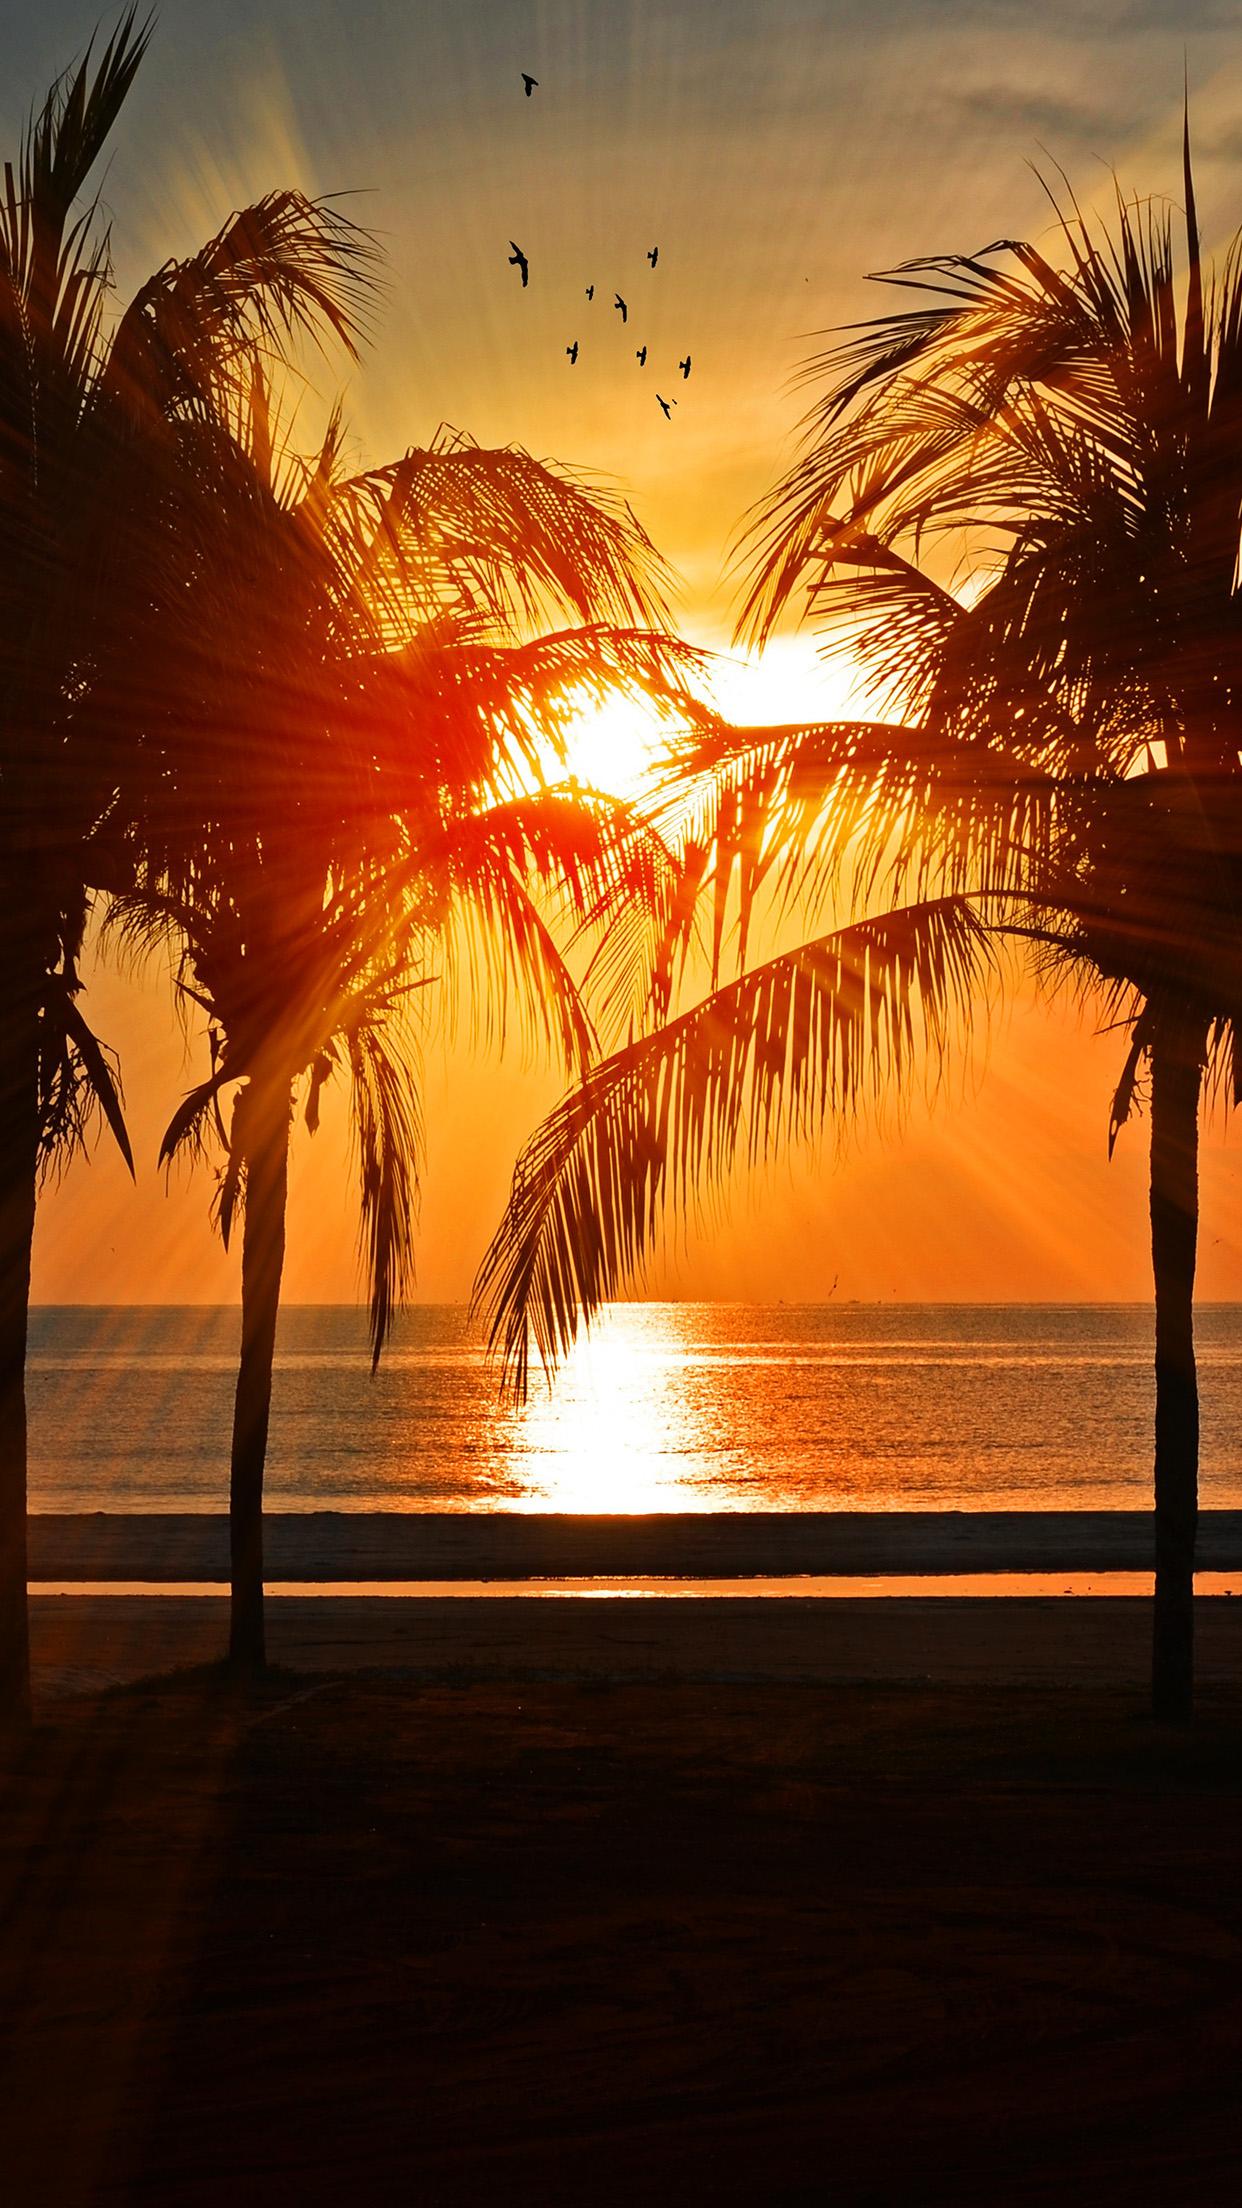 nl74-beach-vacation-summer-night-sunset-red-palm-tree ...